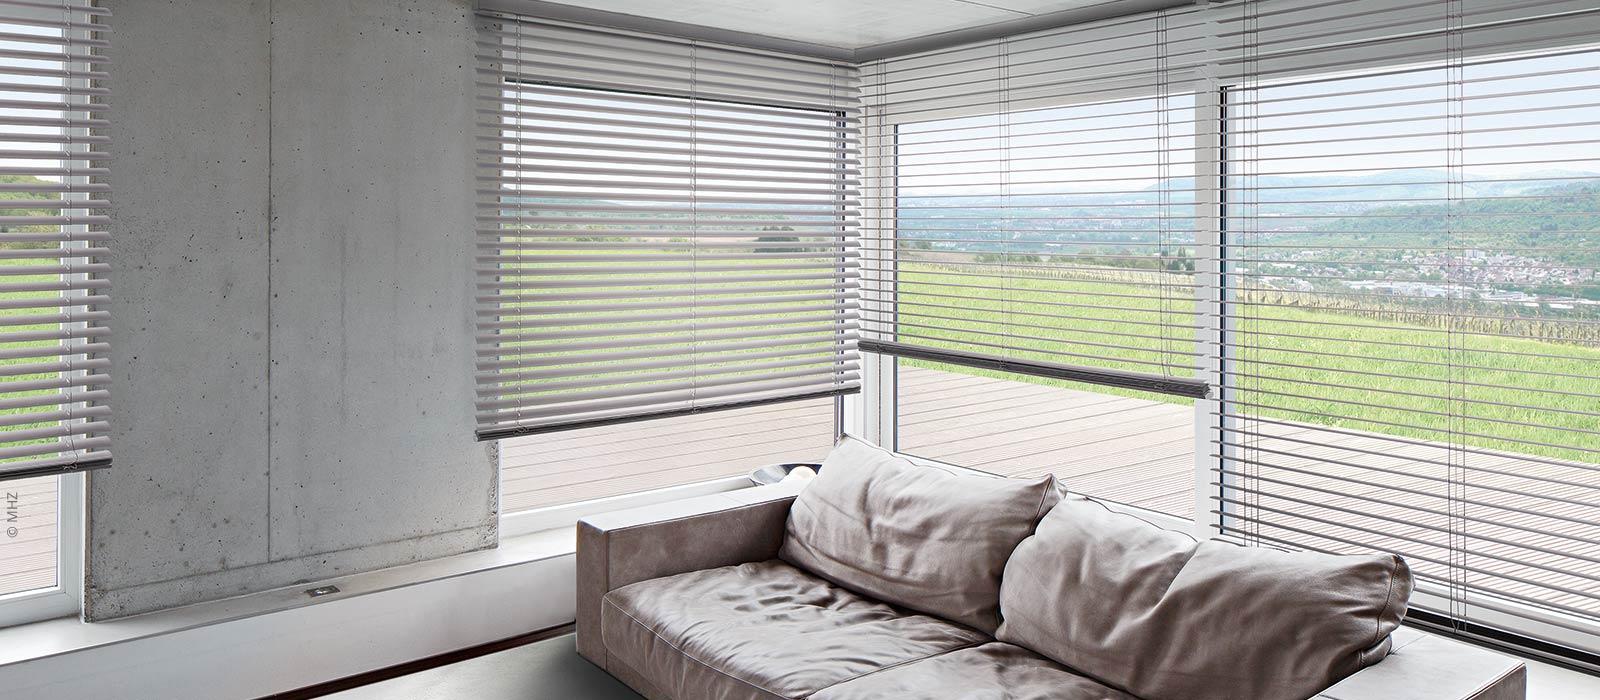 horizontal jalousien blenden alles aus was st rt andr gebauer. Black Bedroom Furniture Sets. Home Design Ideas